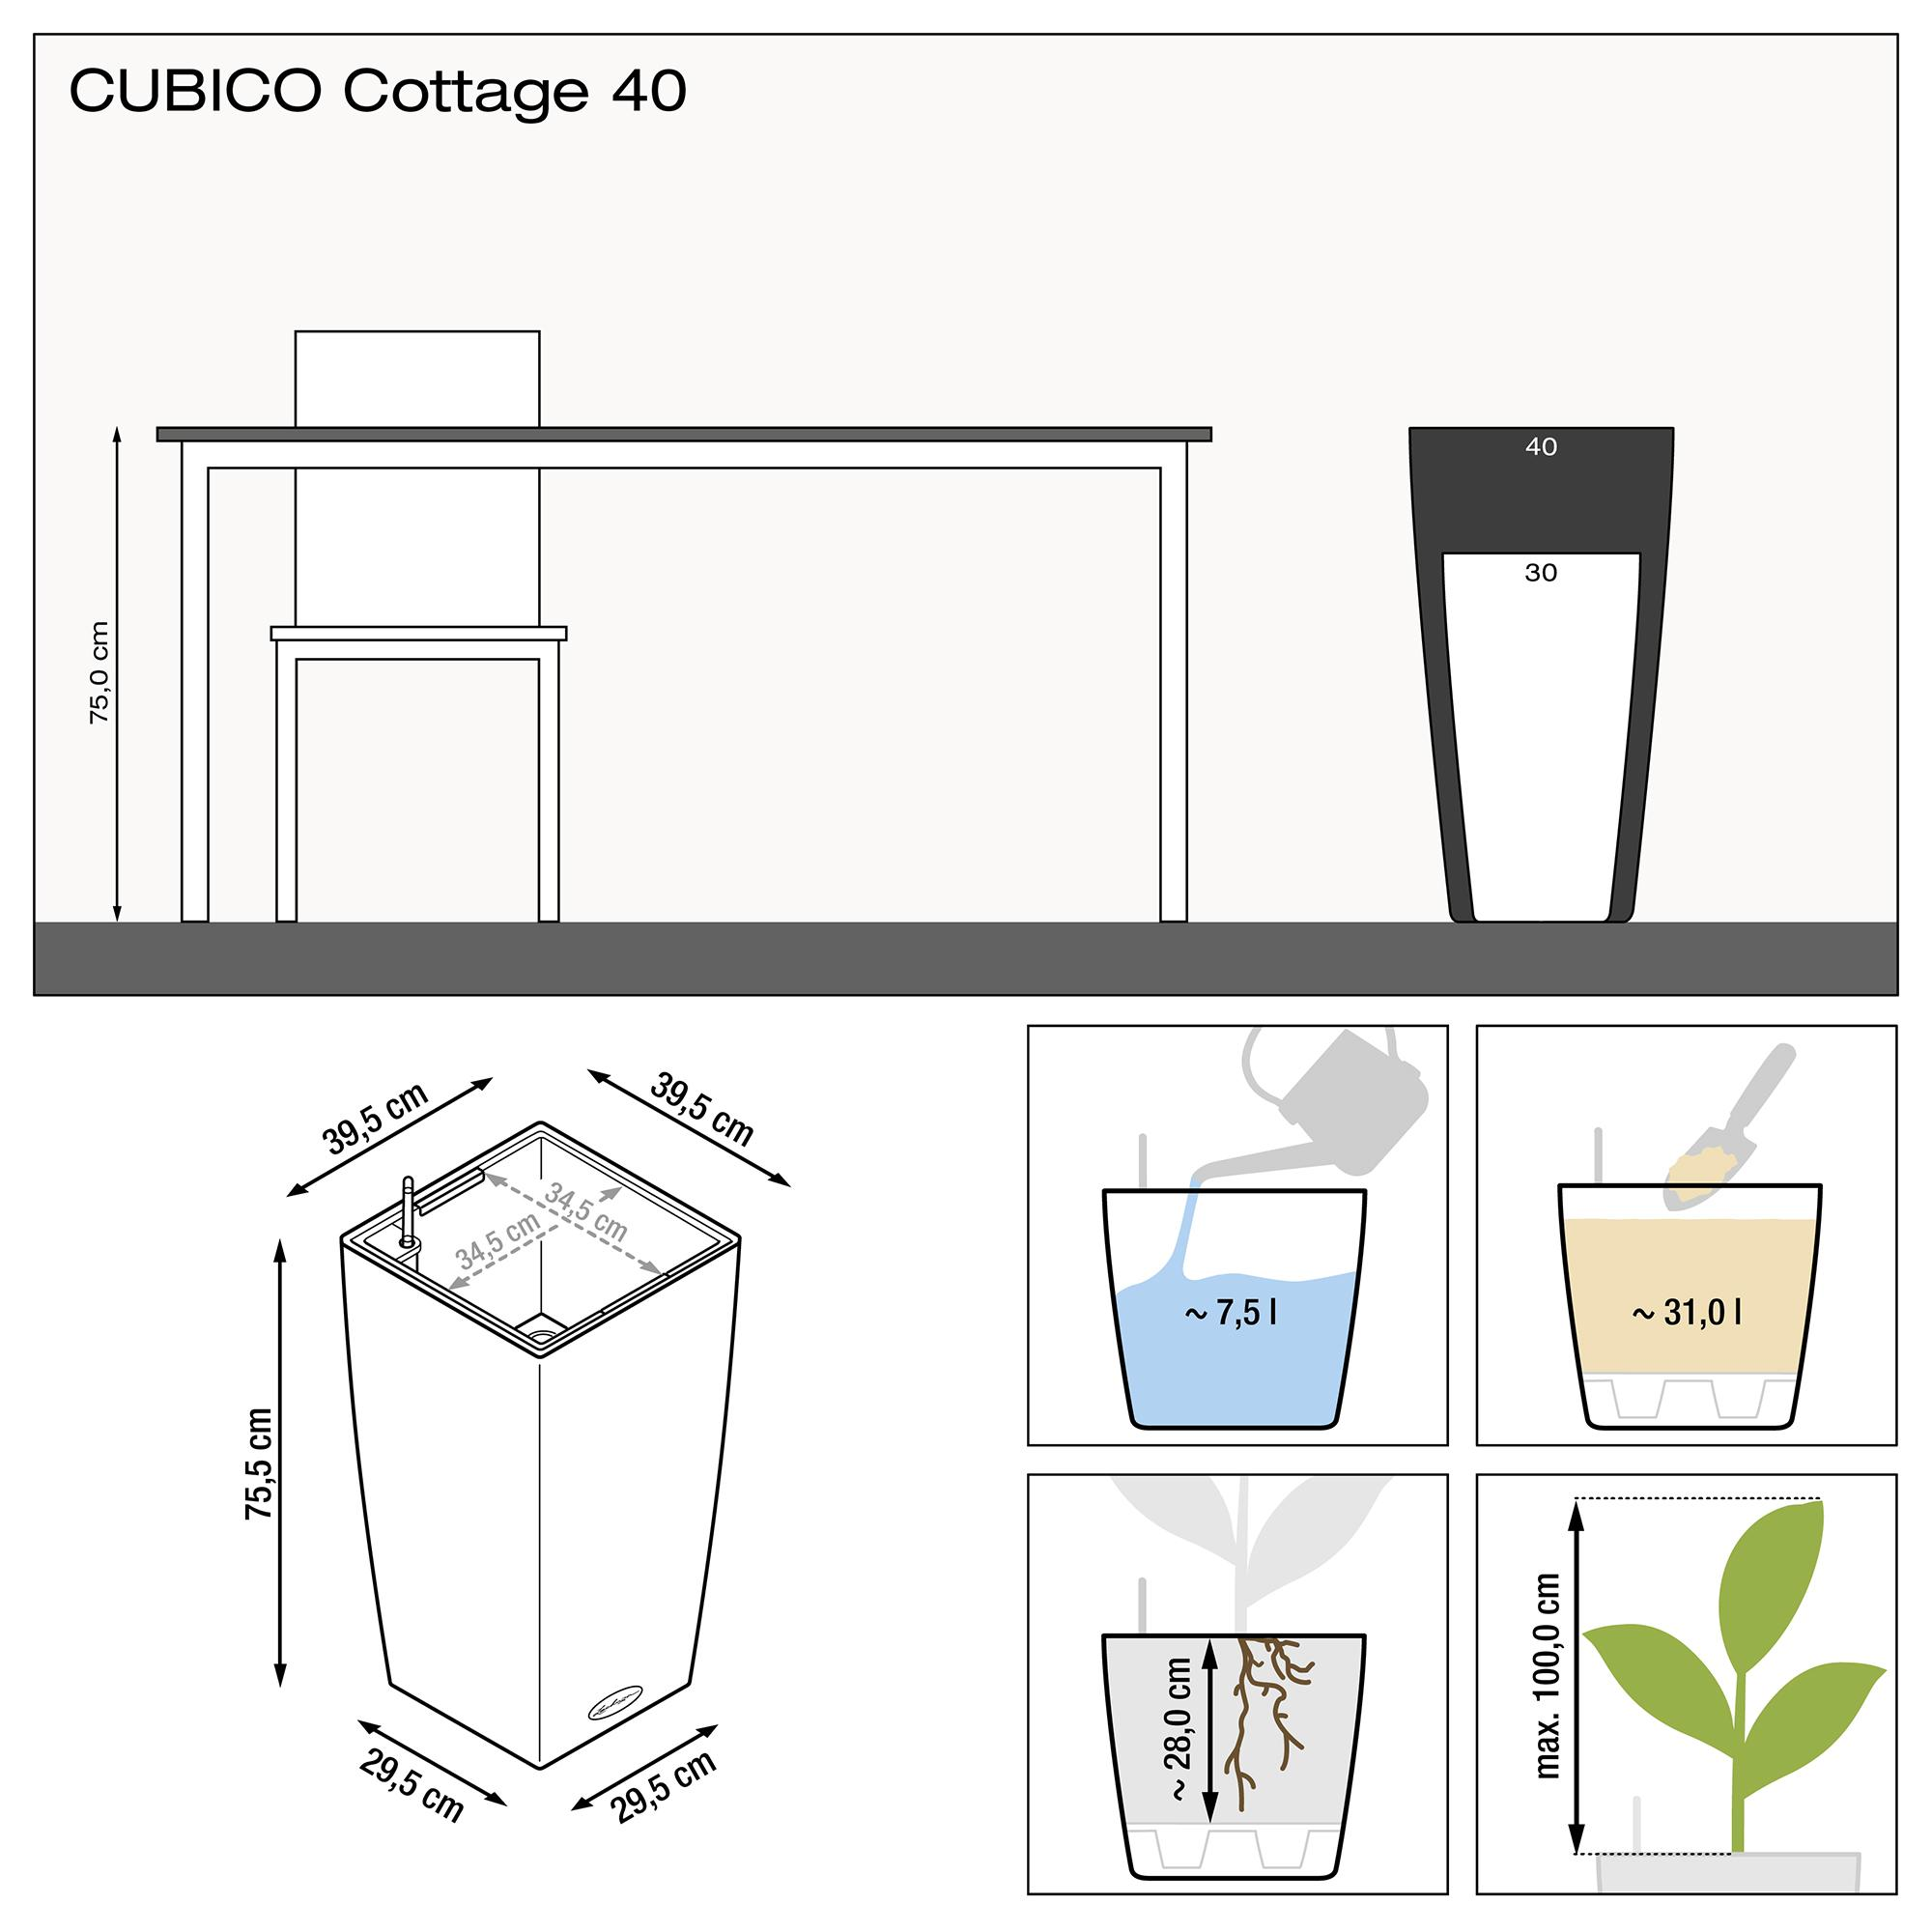 CUBICO Cottage 40 blanc - Image 3